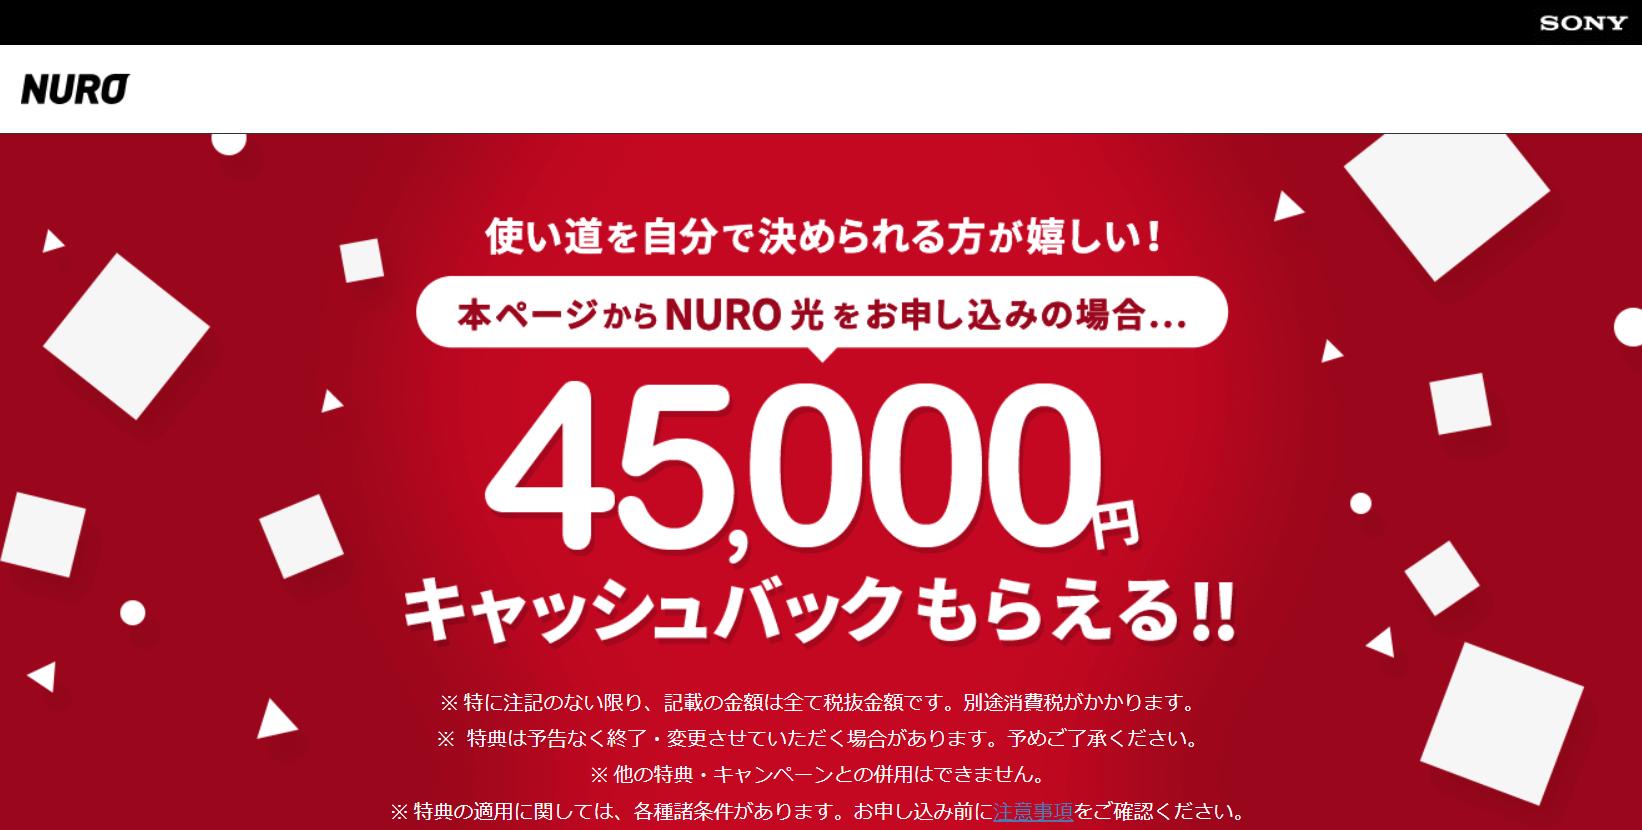 NURO光 公式サイト特設ページのキャンペーン